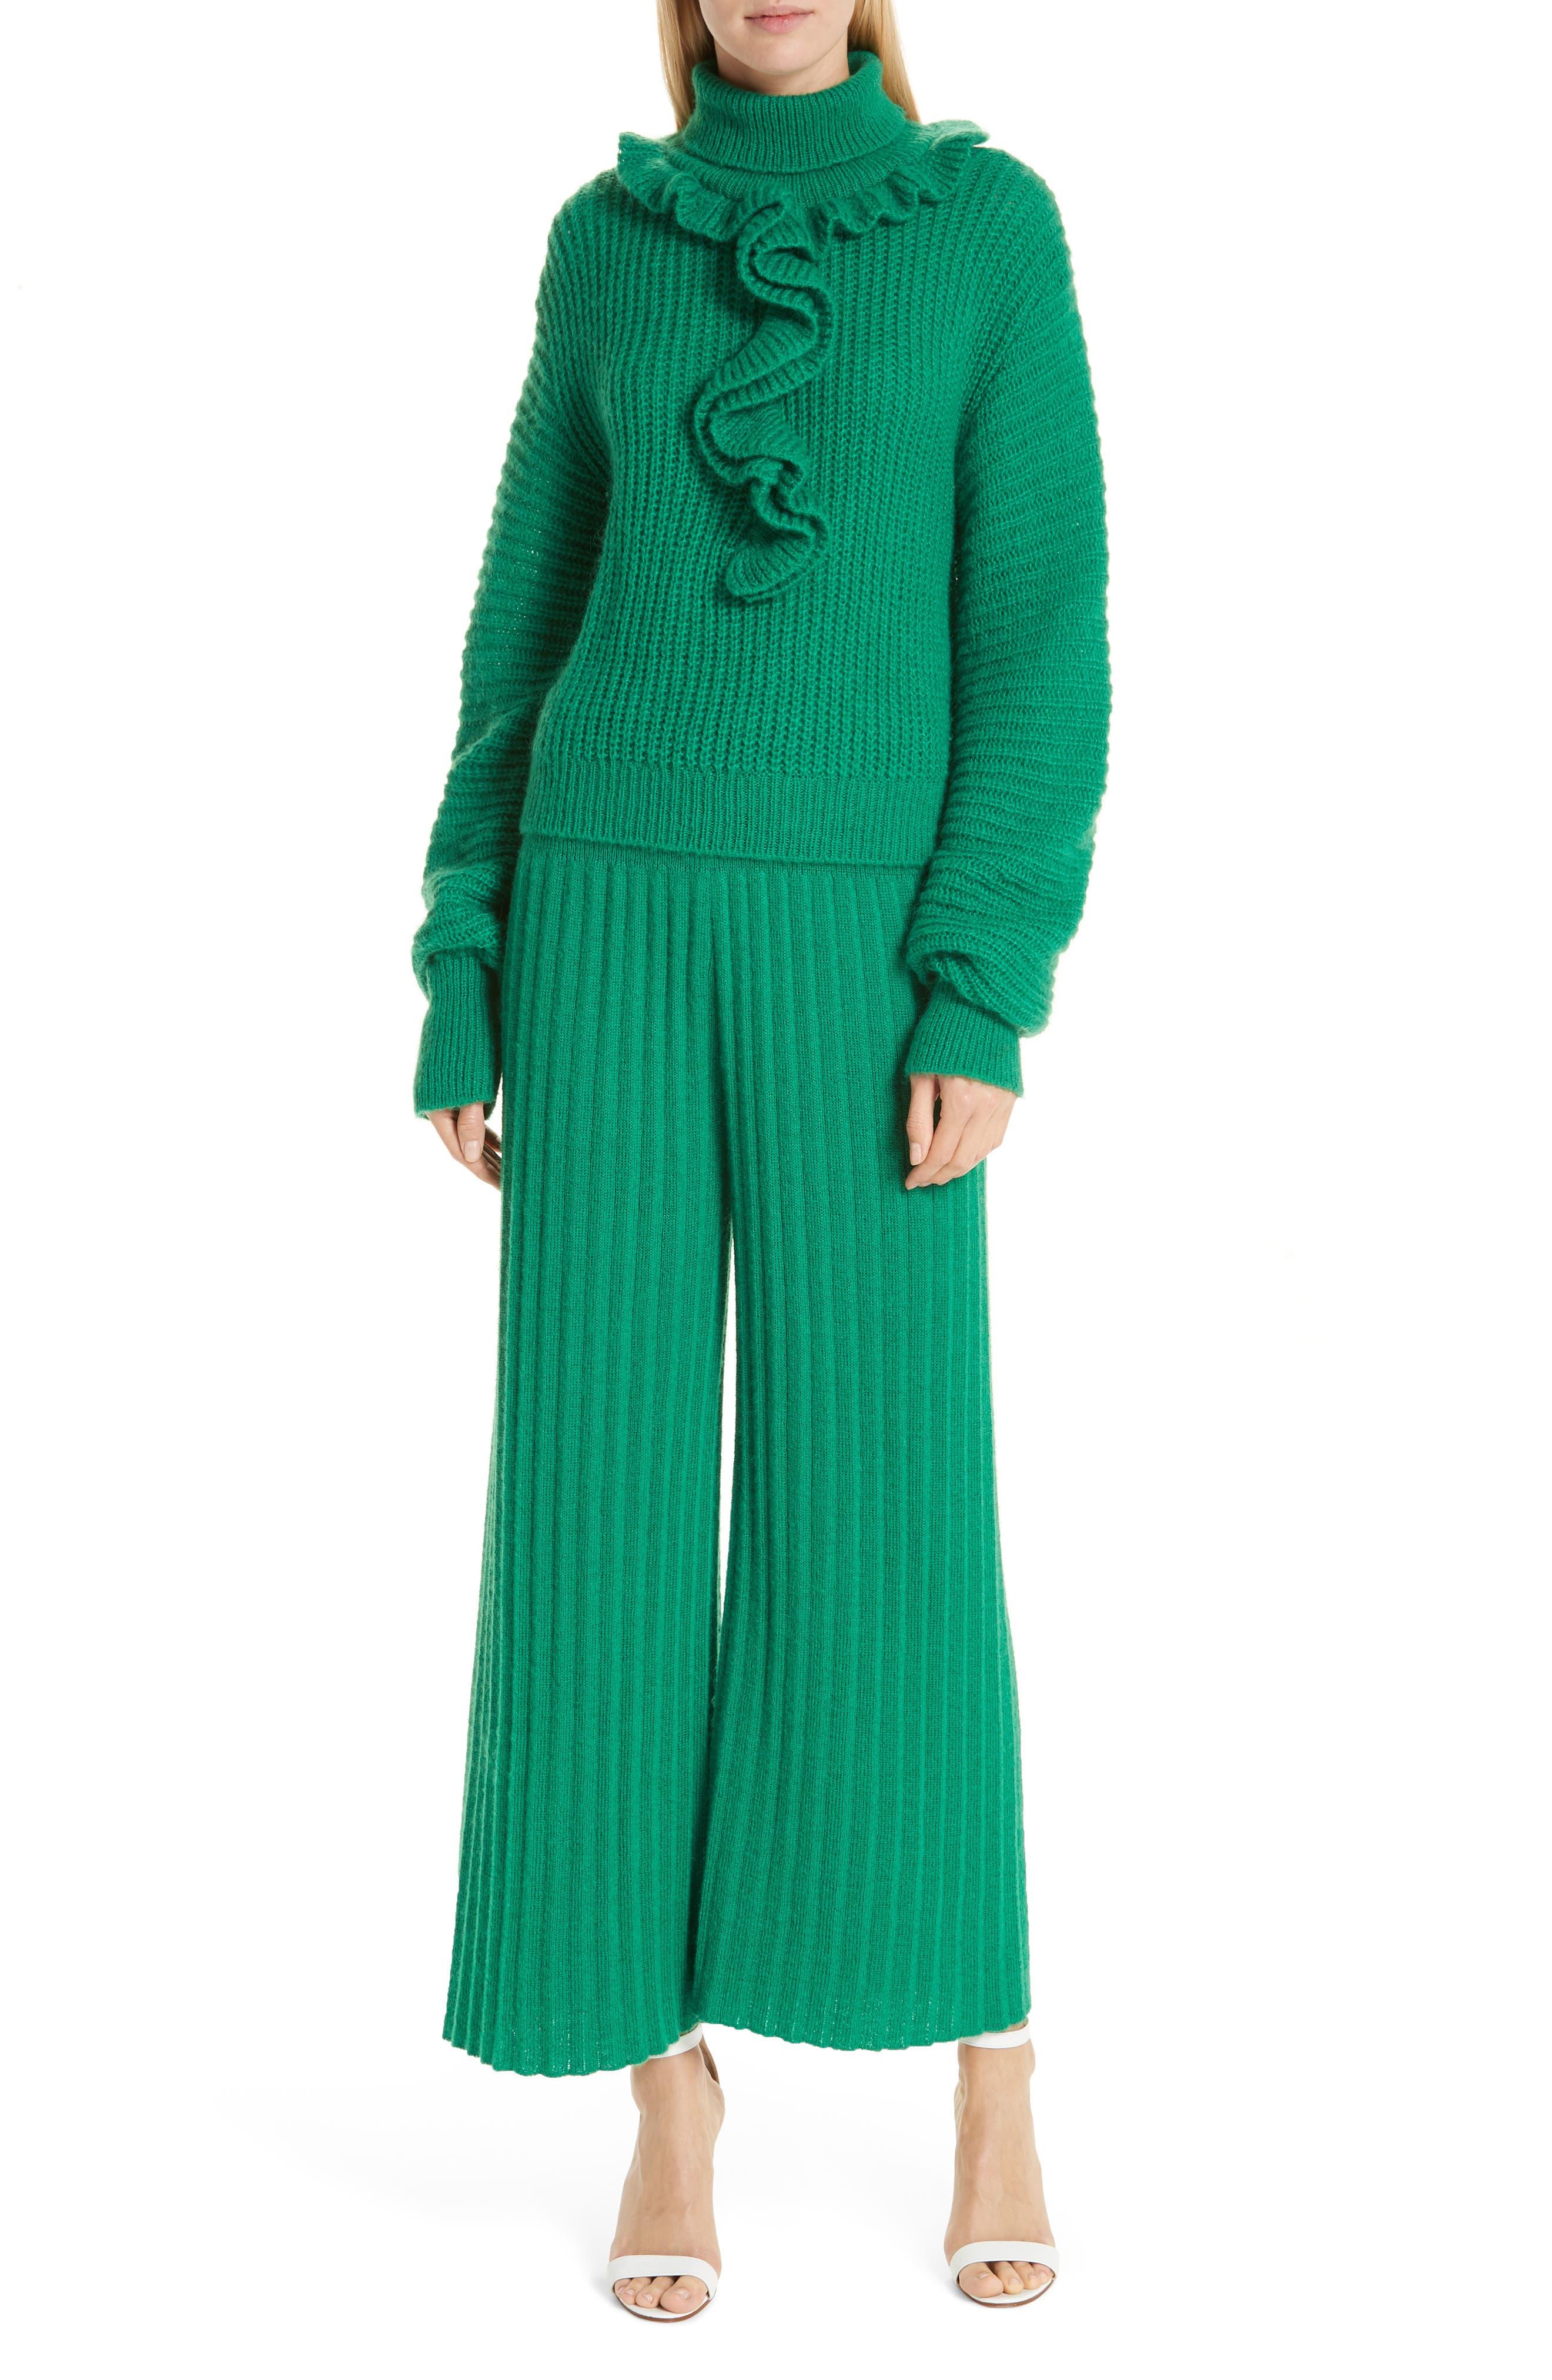 Ruffle Neck Sweater,                             Alternate thumbnail 7, color,                             GRASS GREEN